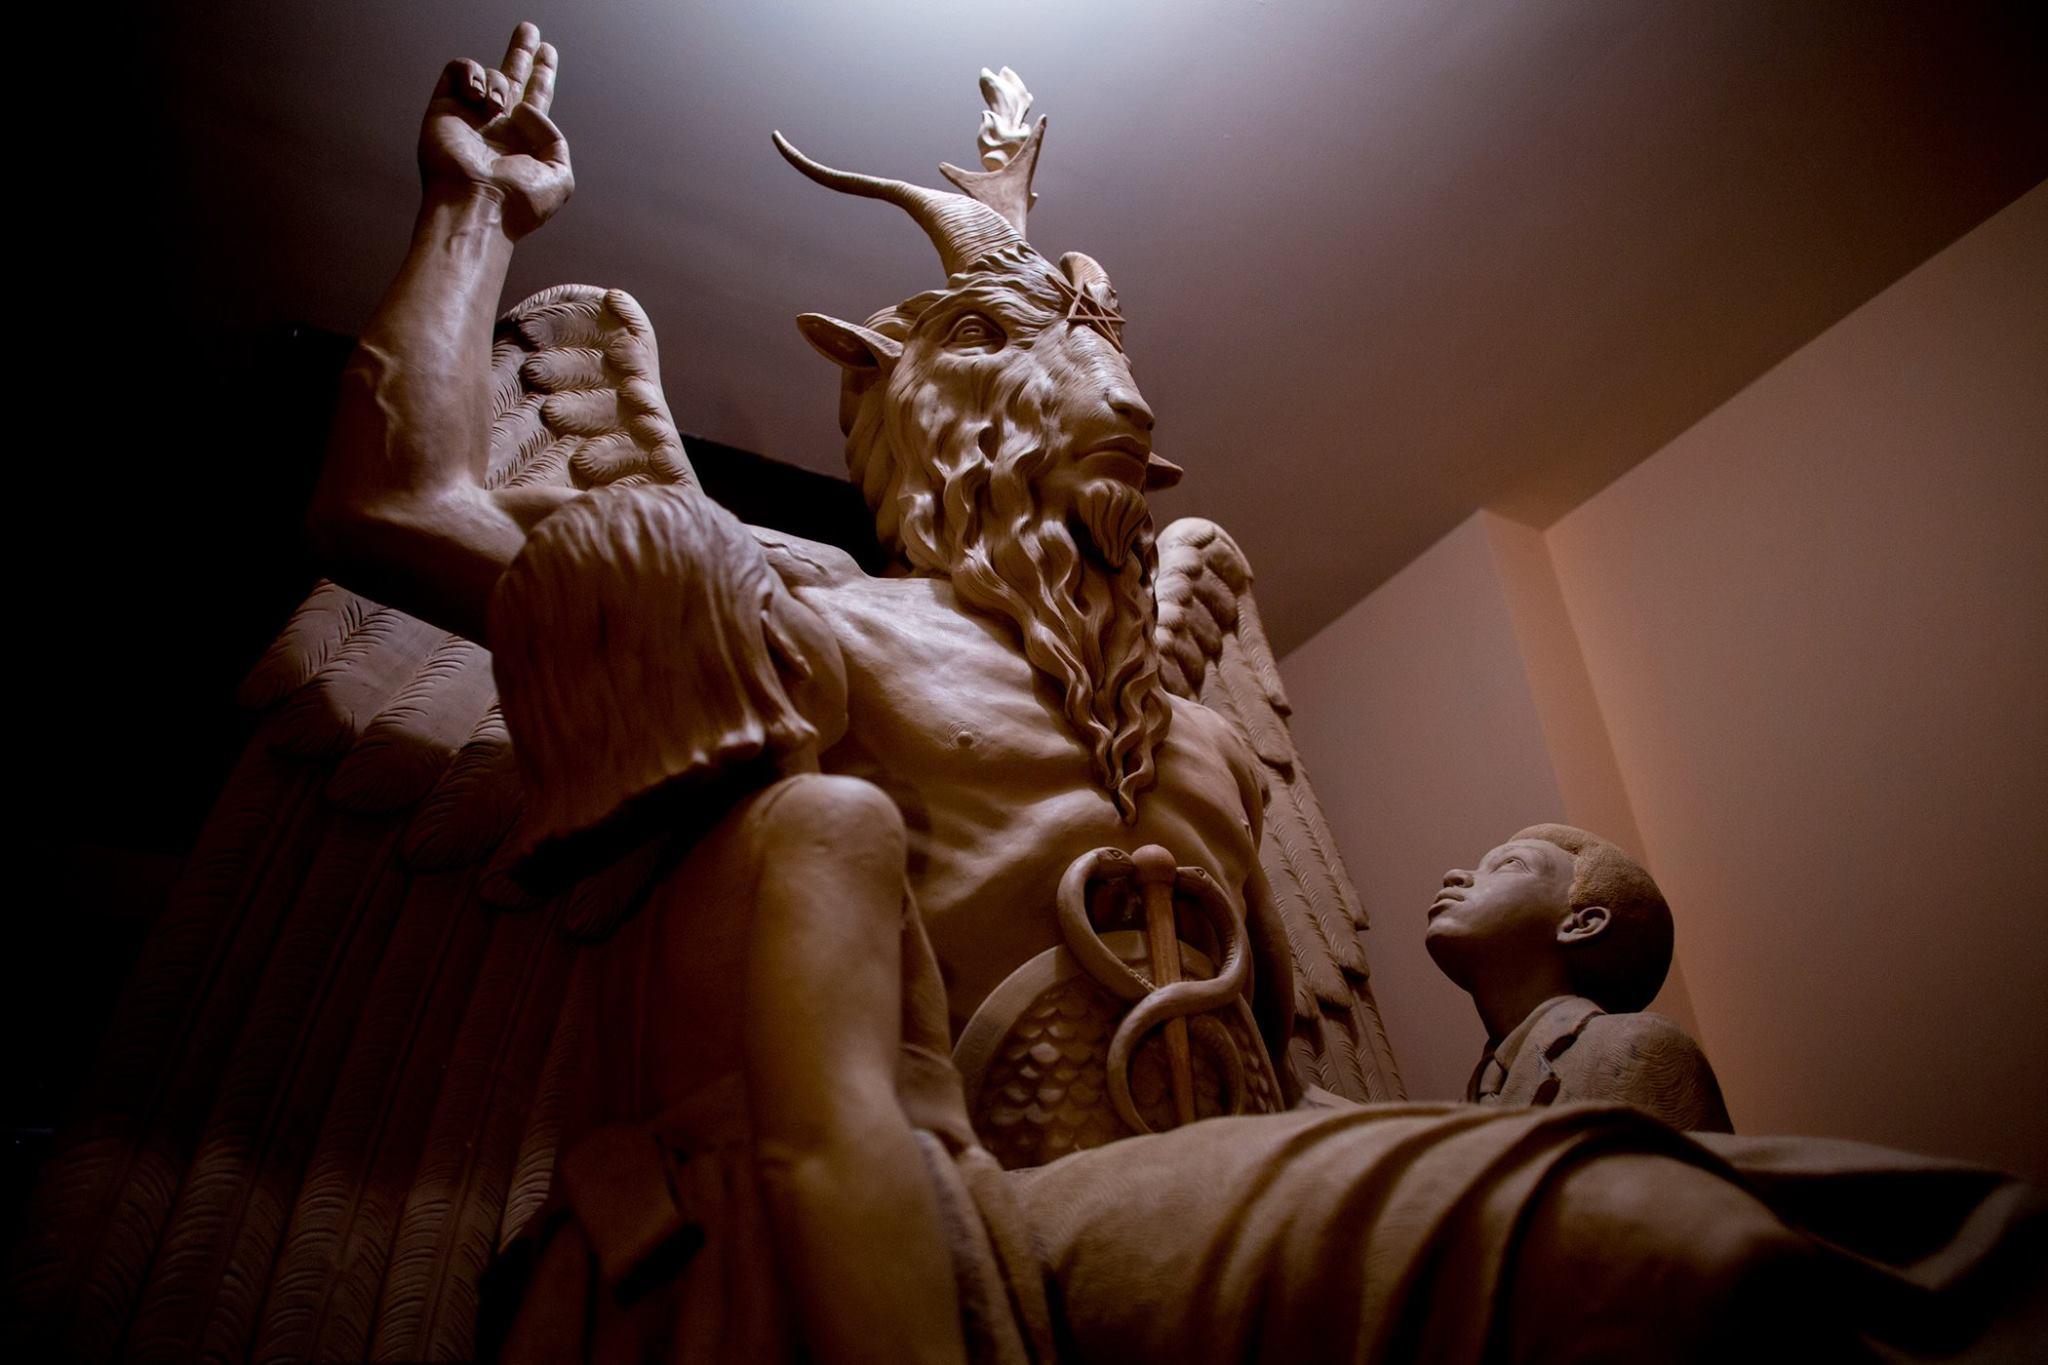 Satanistii americani au inaltat statuia unui demon in Detroit. Localnicii spun ca